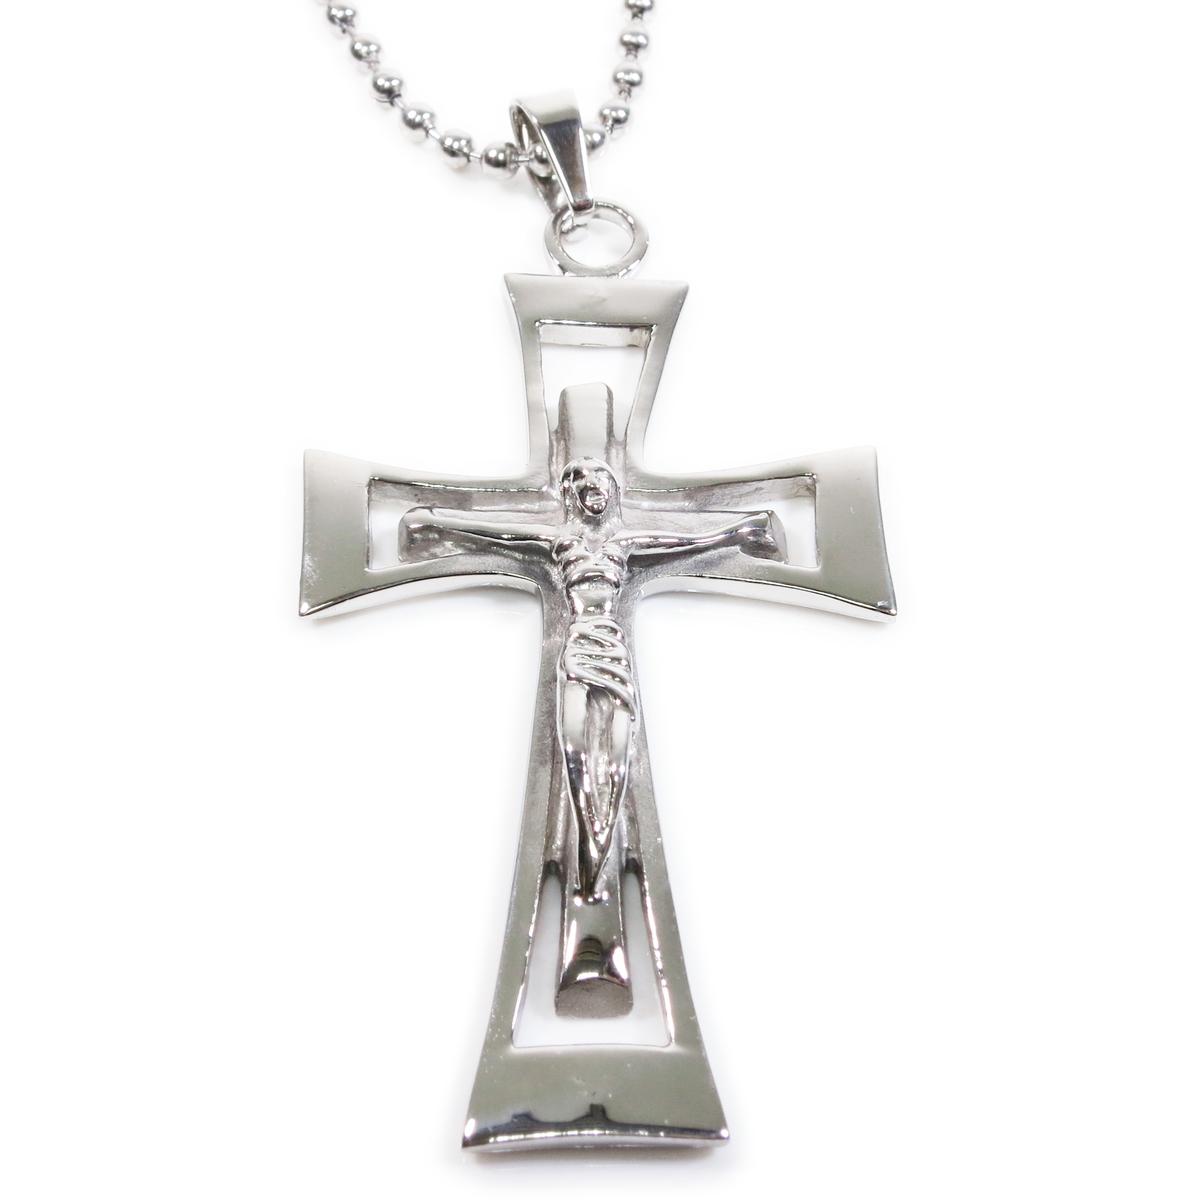 Stainless steel plain jesus cross crucifix pendant